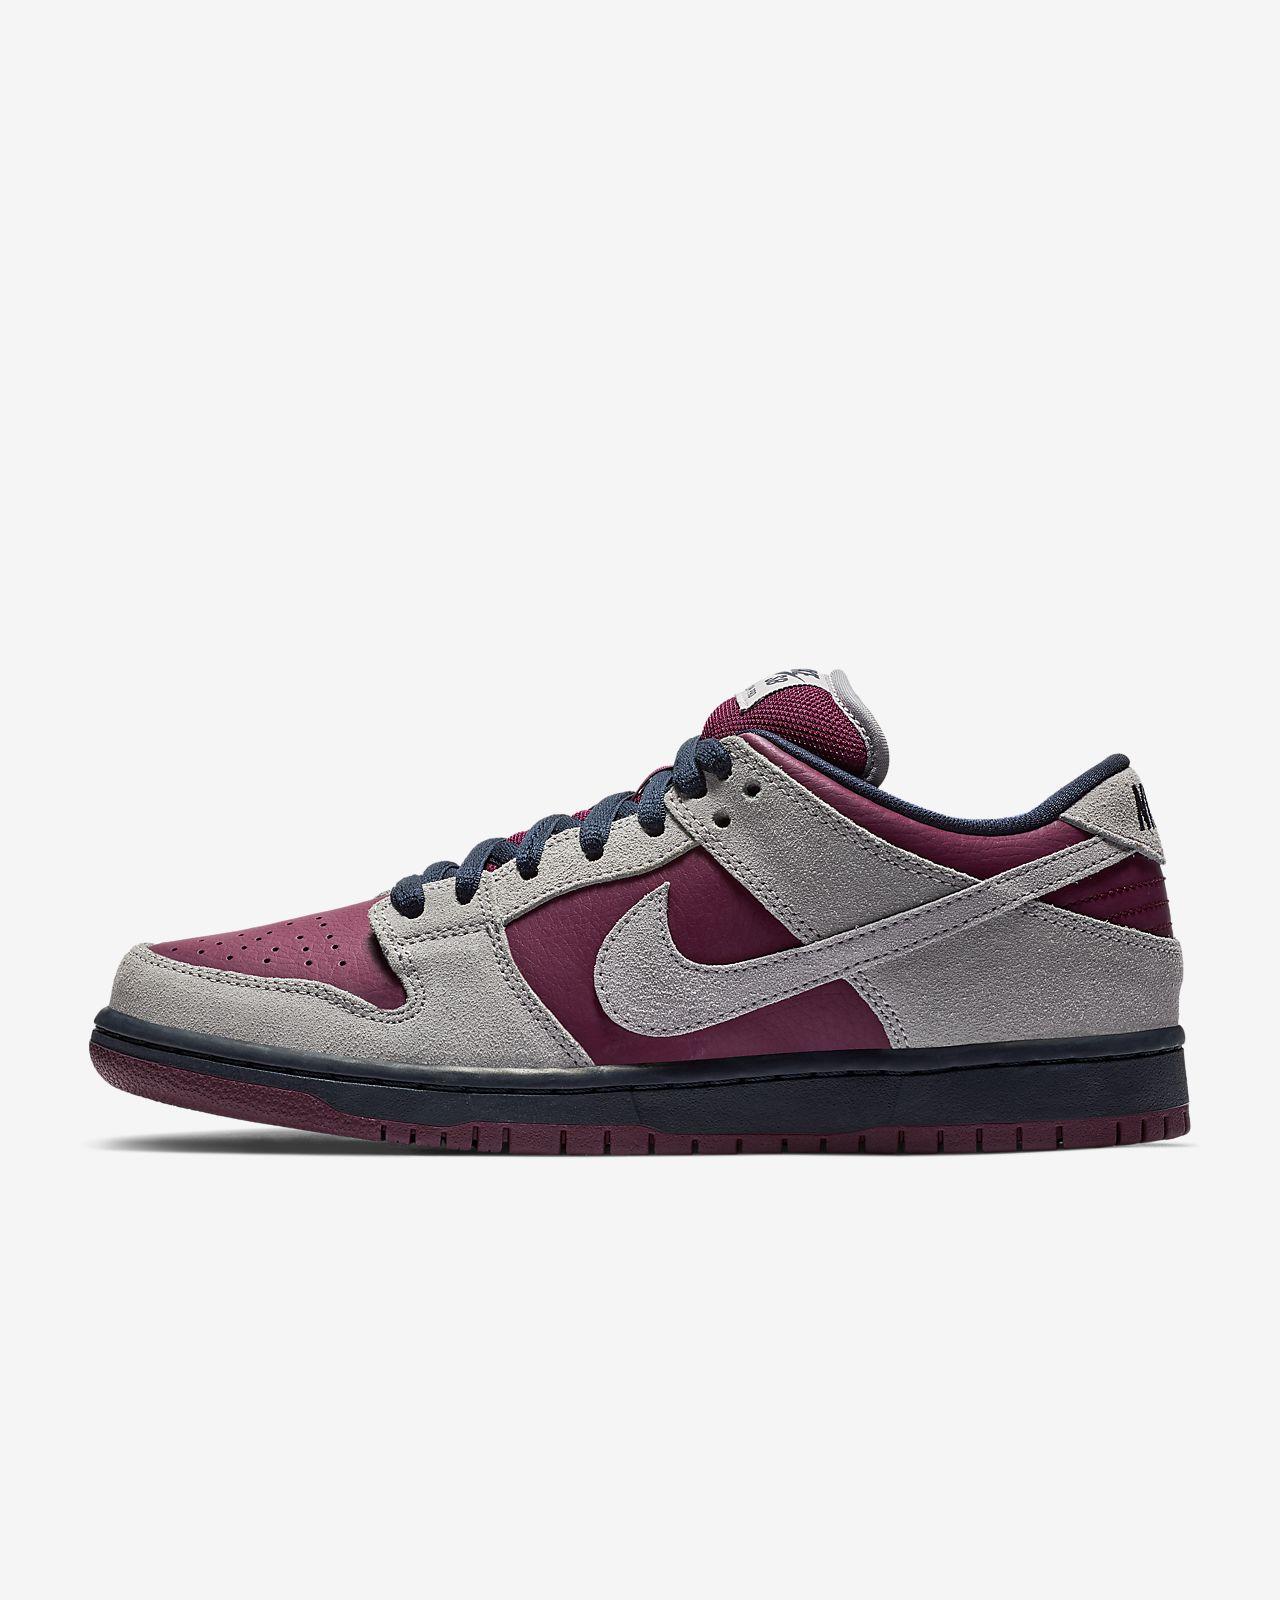 Nike SB Dunk Low Pro Skate Shoe